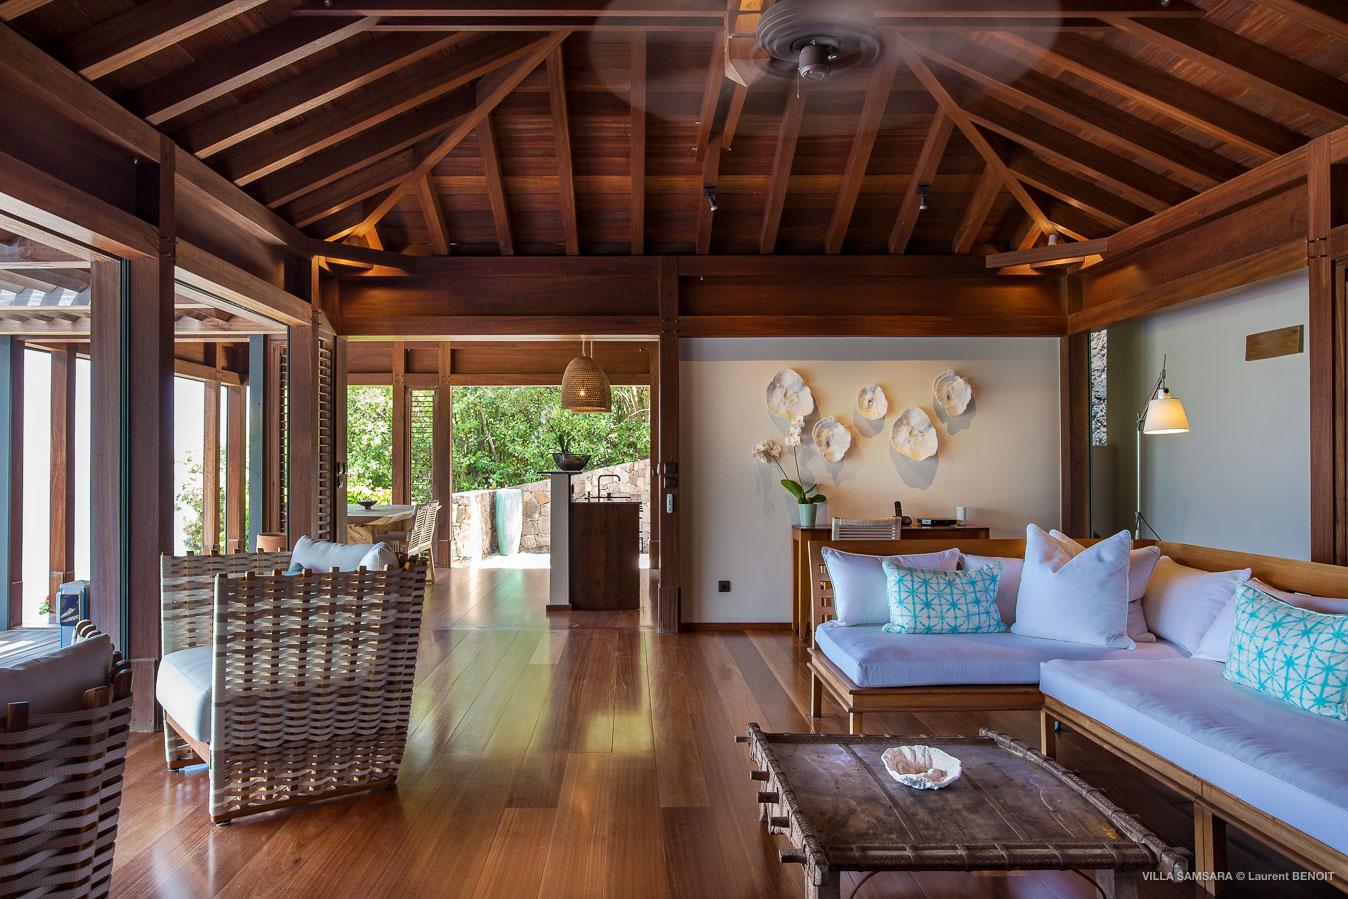 Villa Samsara - Sunset Villa For Rent St Barth Pointe Milou in Balinese Wood - Main Area